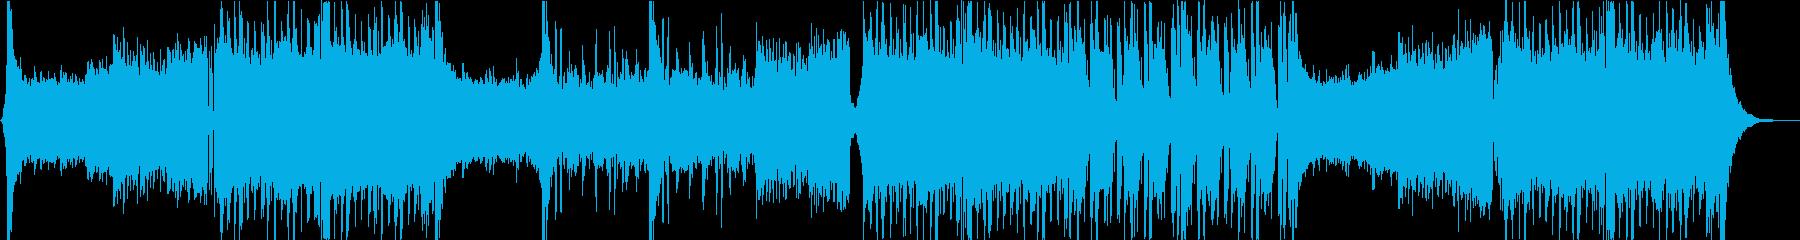 eスポーツ 大会 EDM オケのみの再生済みの波形